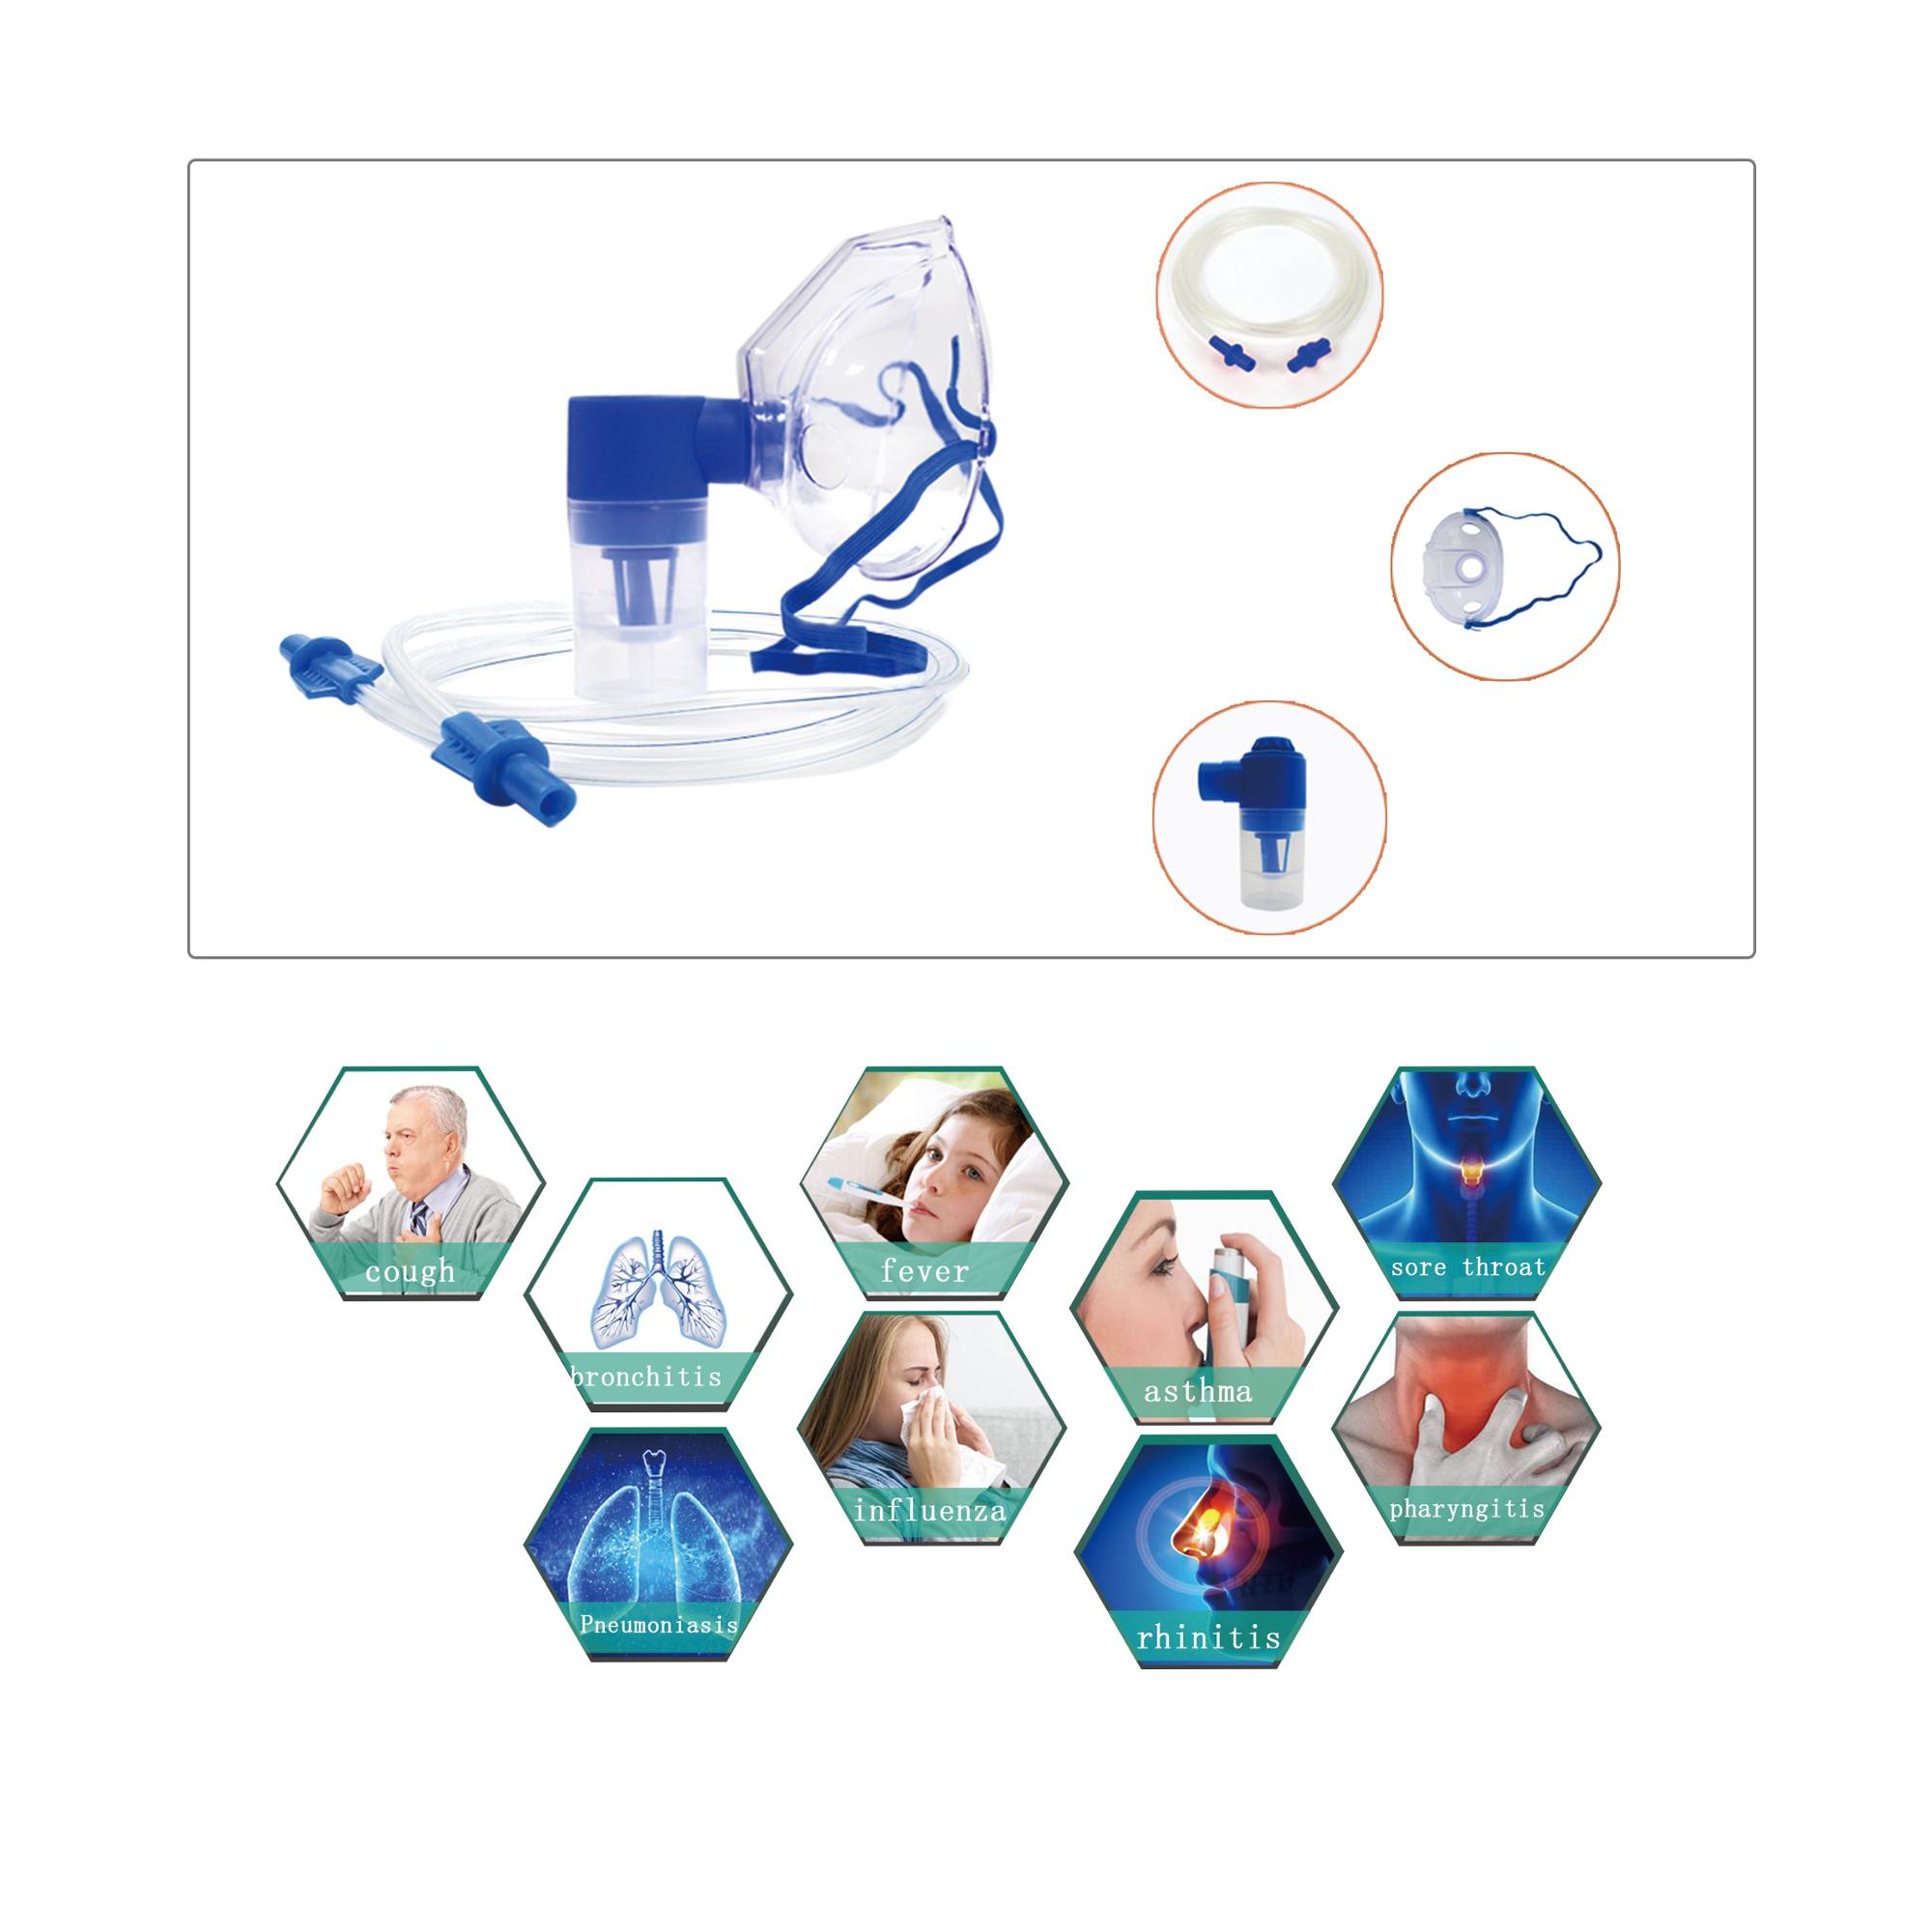 Medical-Care-Sterile-Nebulizer-Mask-Kits-With